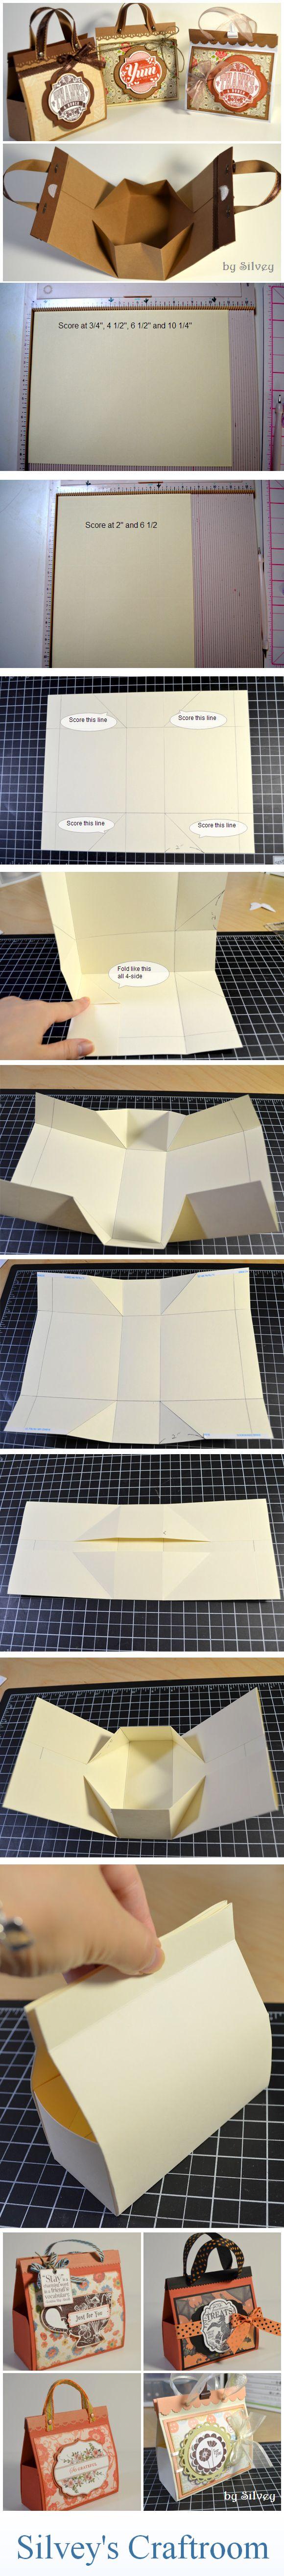 Mini Bag | #craft #box #diy #borsa #contenitore #faidate #cartoncino #idea #tutorial | by http://stampwithsilvey.blogspot.ro/2012/08/mini-bag-tutorial.html